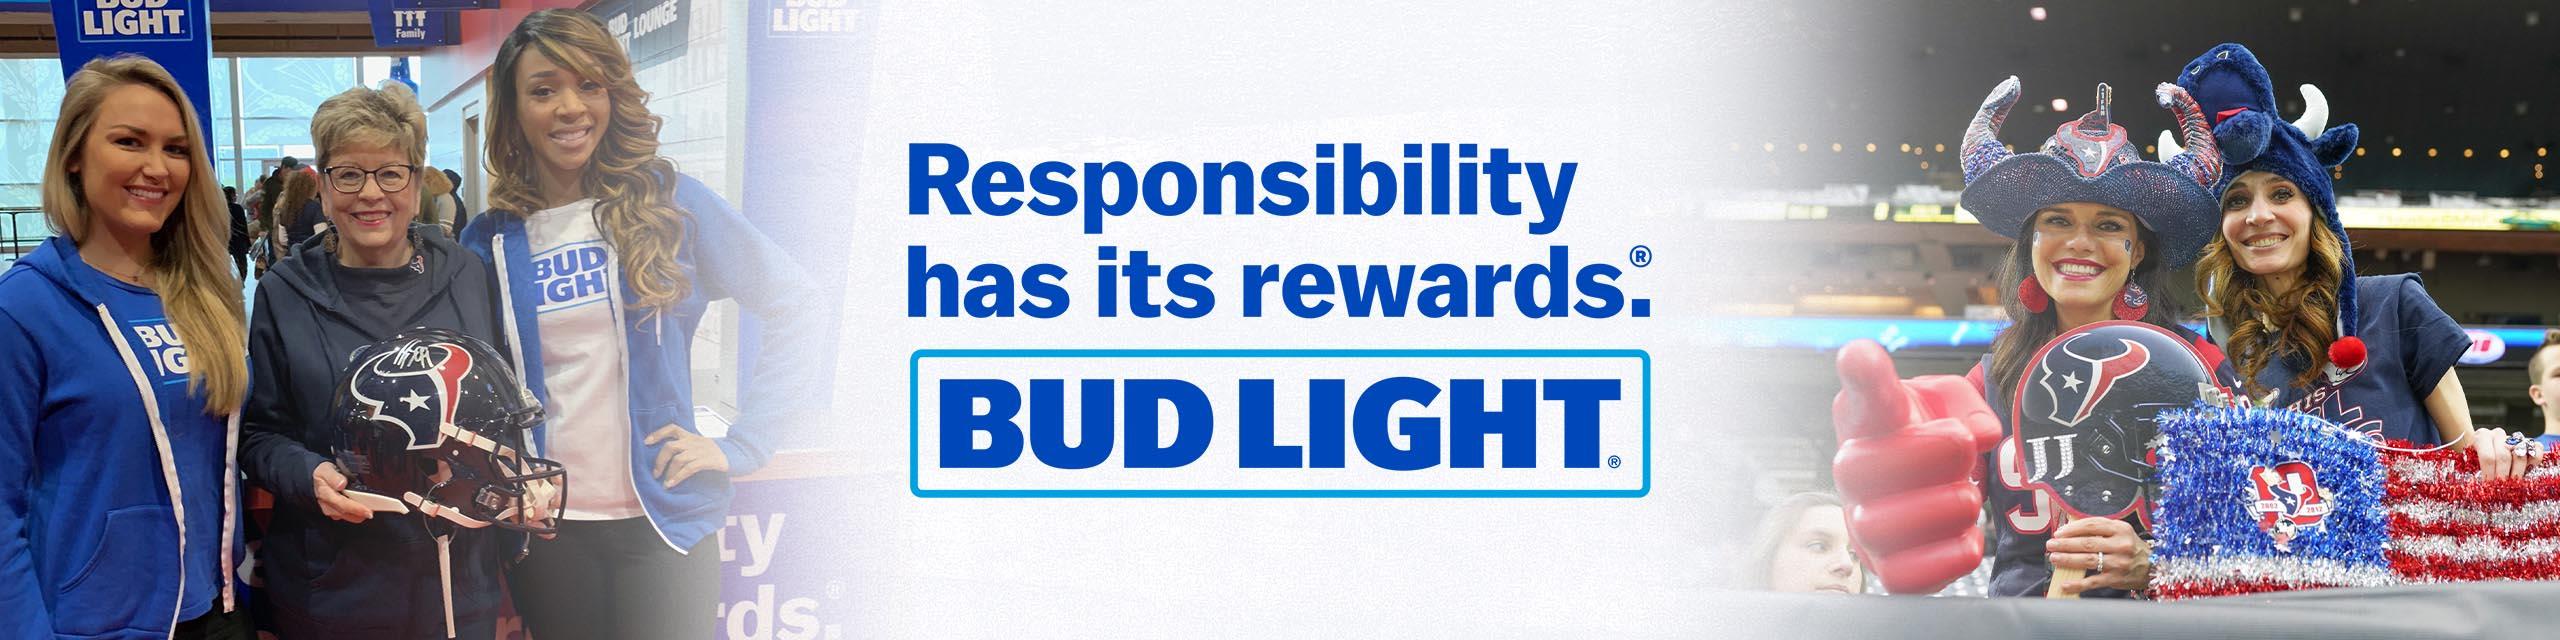 Responsibility Has its Rewards_Hero